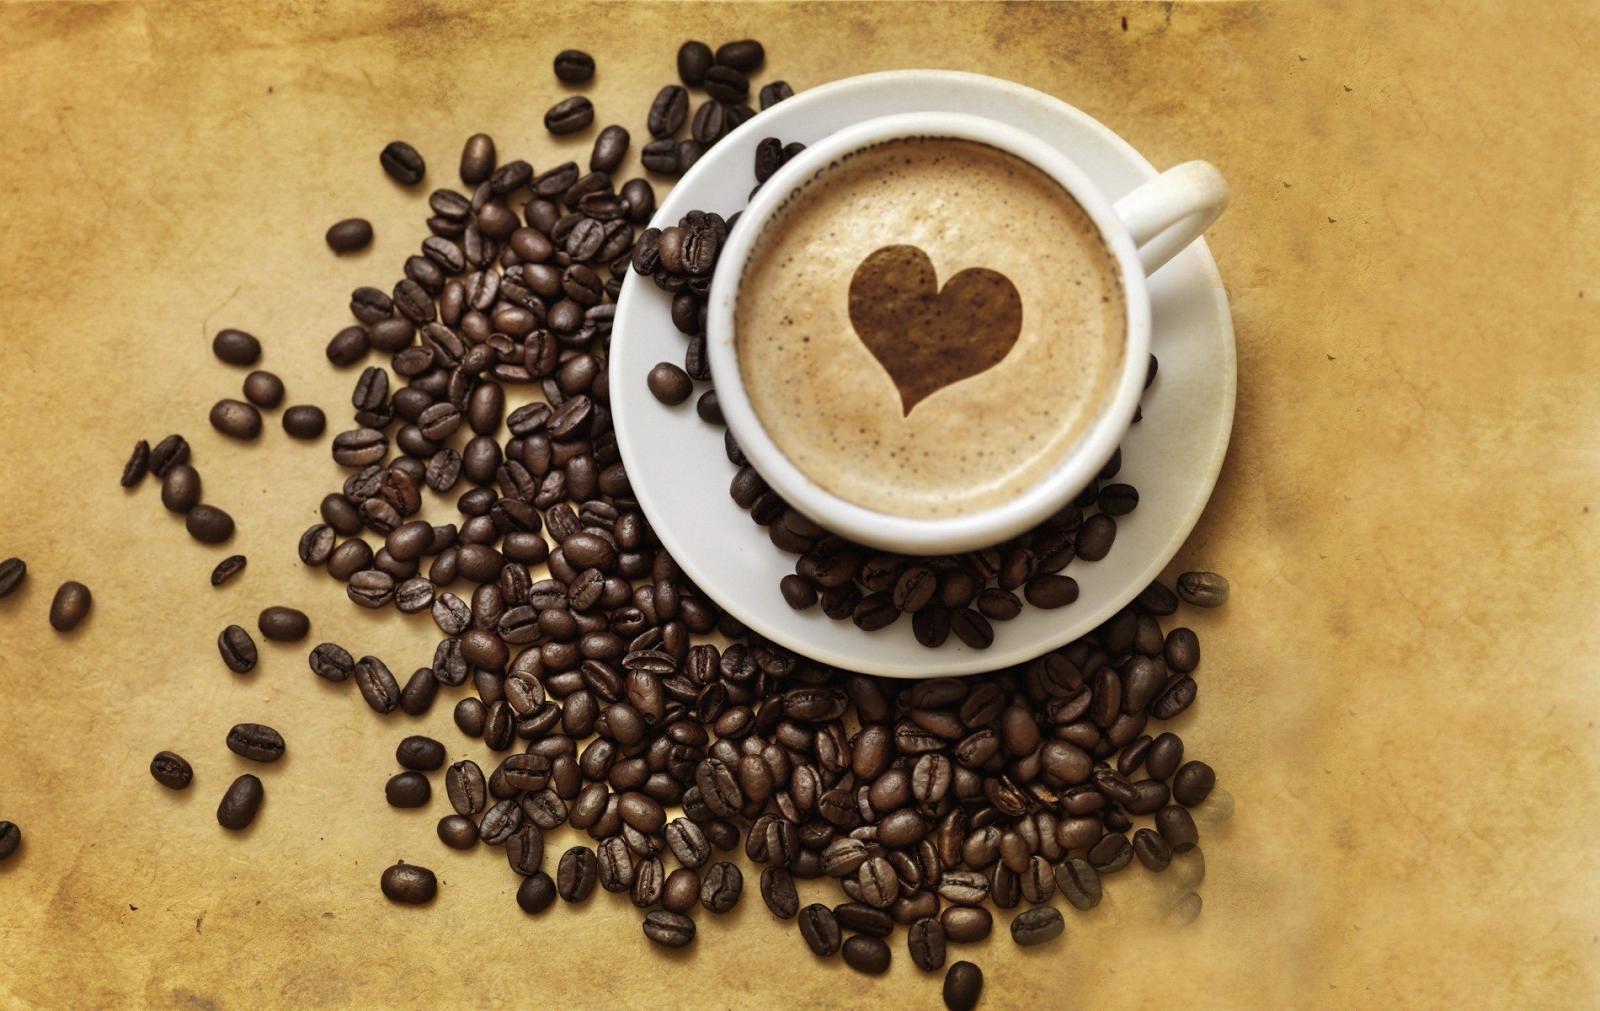 Good Morning Wallpapers Hd Download Free 1080p Good Morning Hd